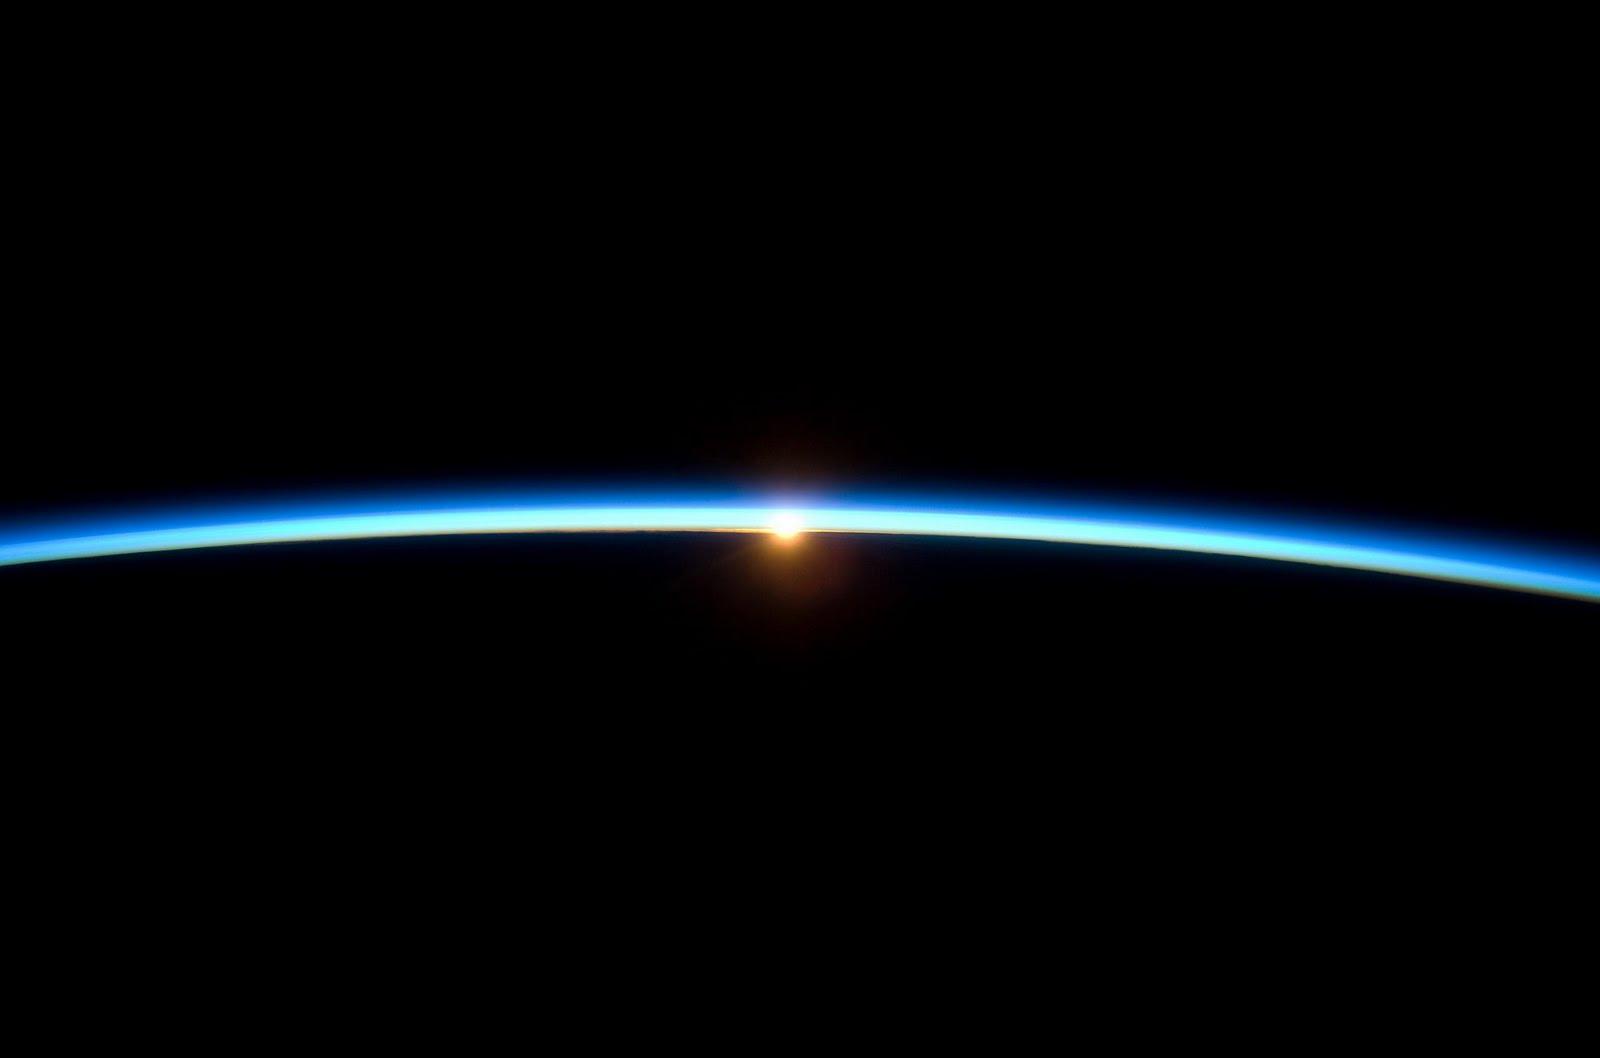 Gambar-gambar terbaik dari NASA [16g@F]